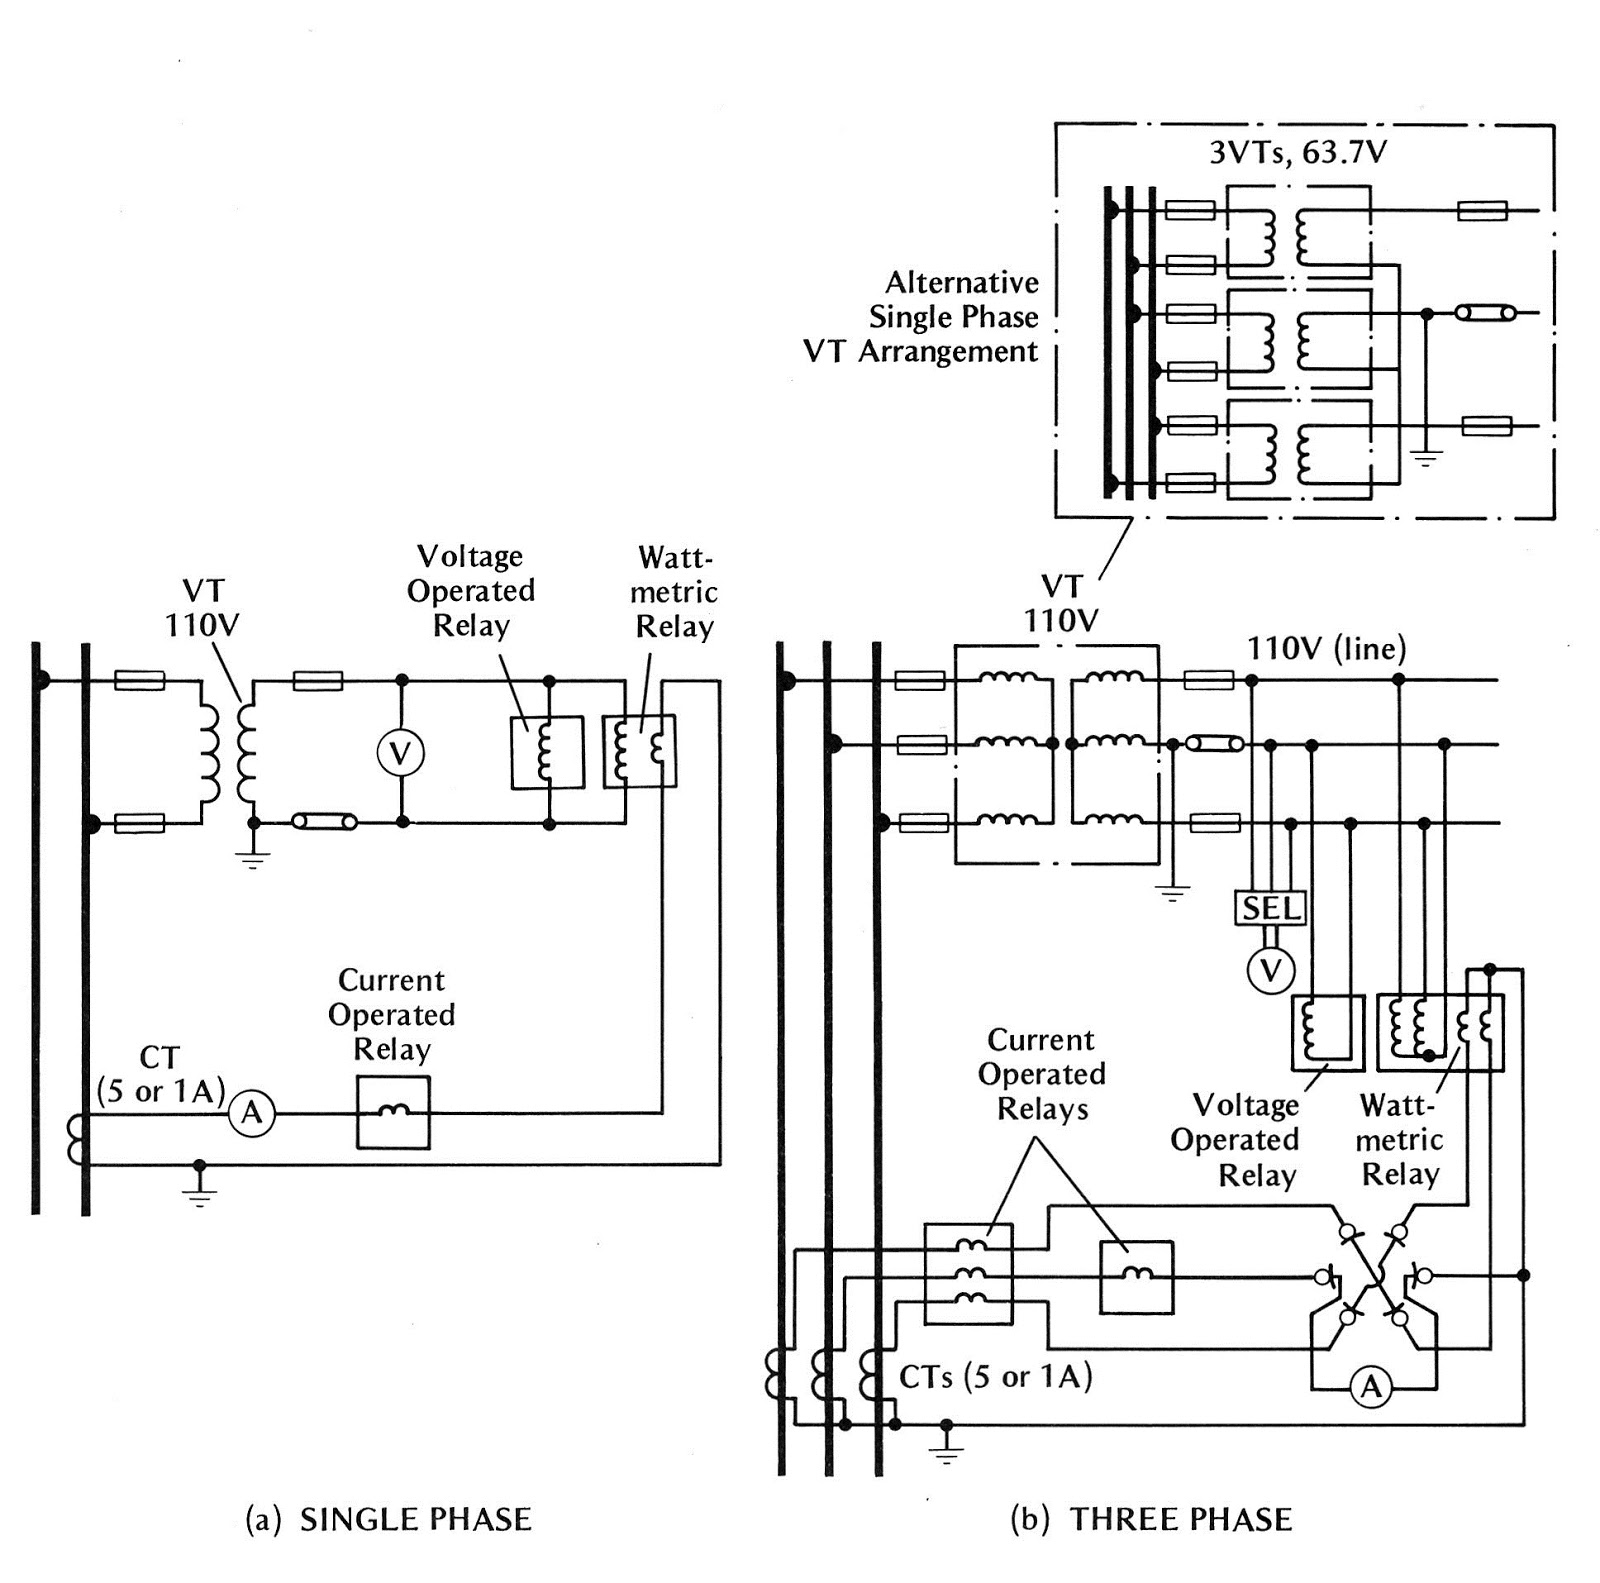 Pretty Telecaster 5 Way Switch Wiring Diagram Small Www Bulldog Com Rectangular Car Alarm Installation Diagram Alarm Diagram Old Breaker Panel Wiring BlackElectrical Panel Installation Simple Single Phase Transformer Wiring Diagram   Dolgular